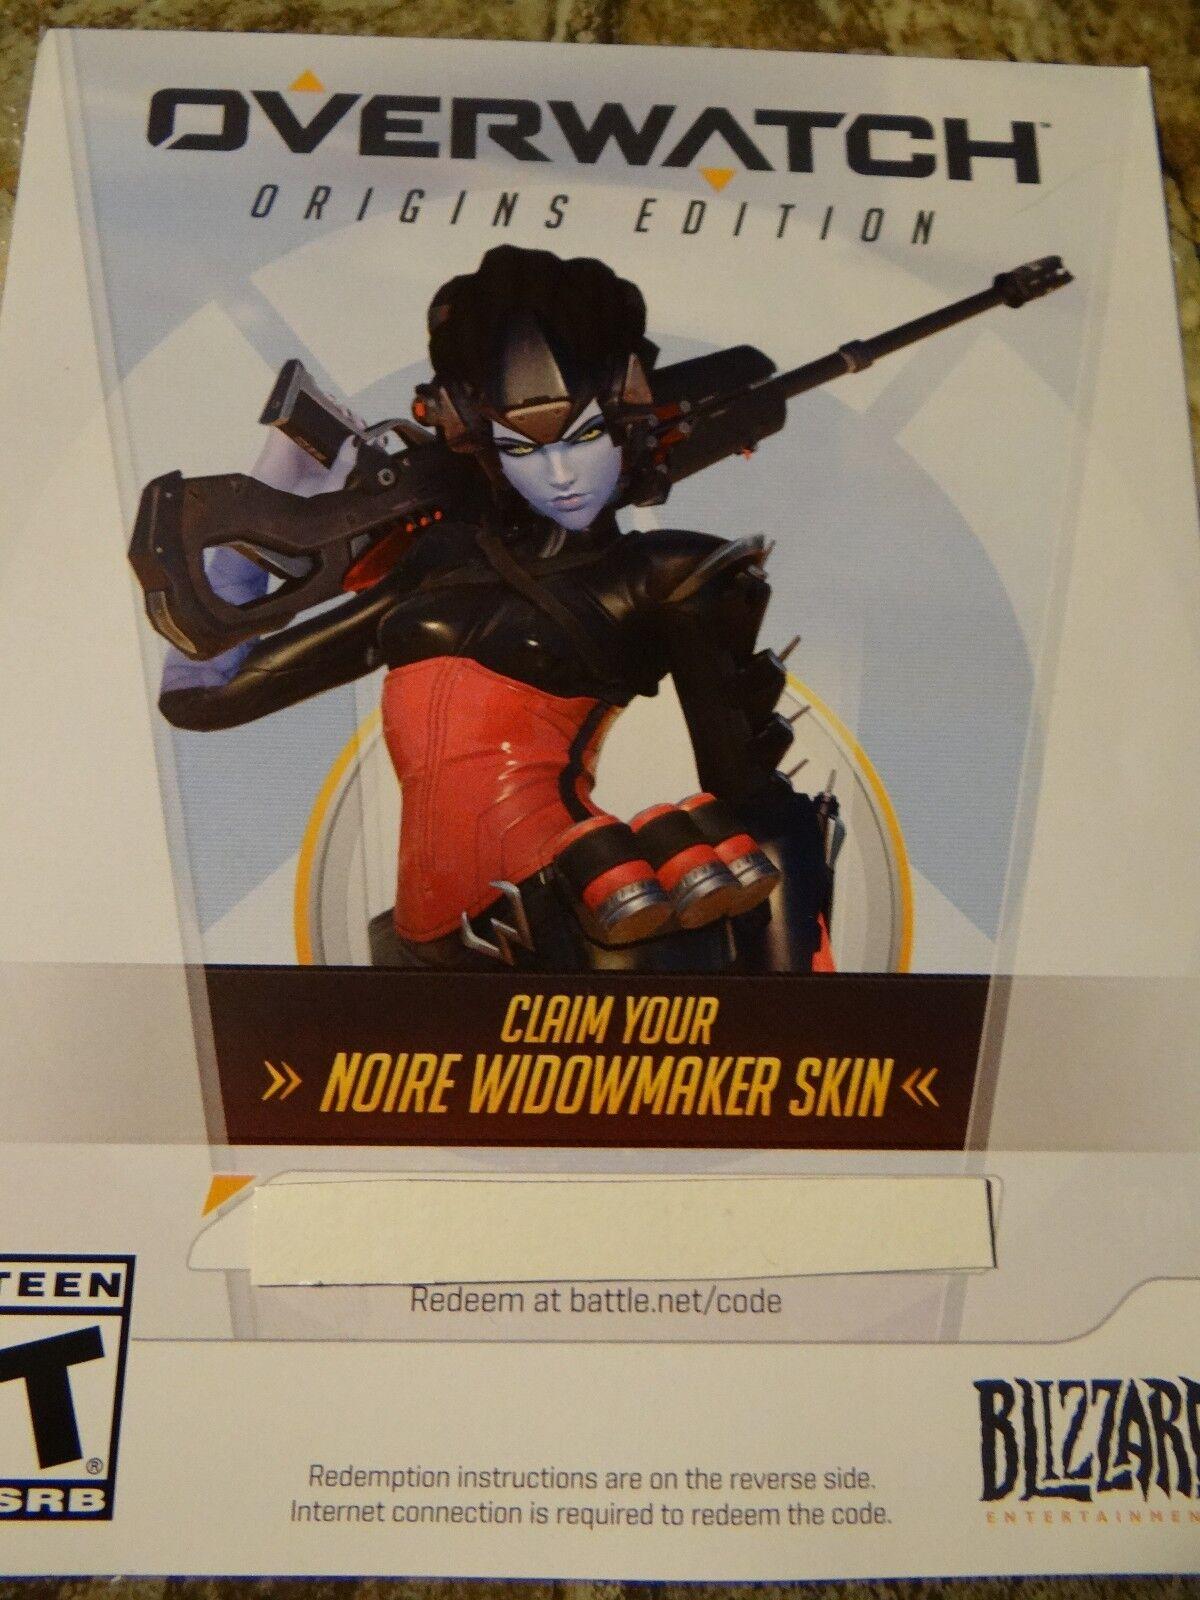 Overwatch Widowmaker Preorder Noire Legendary Skin DLC Code  PC Region Free    Shopping Bin - Search eBay faster